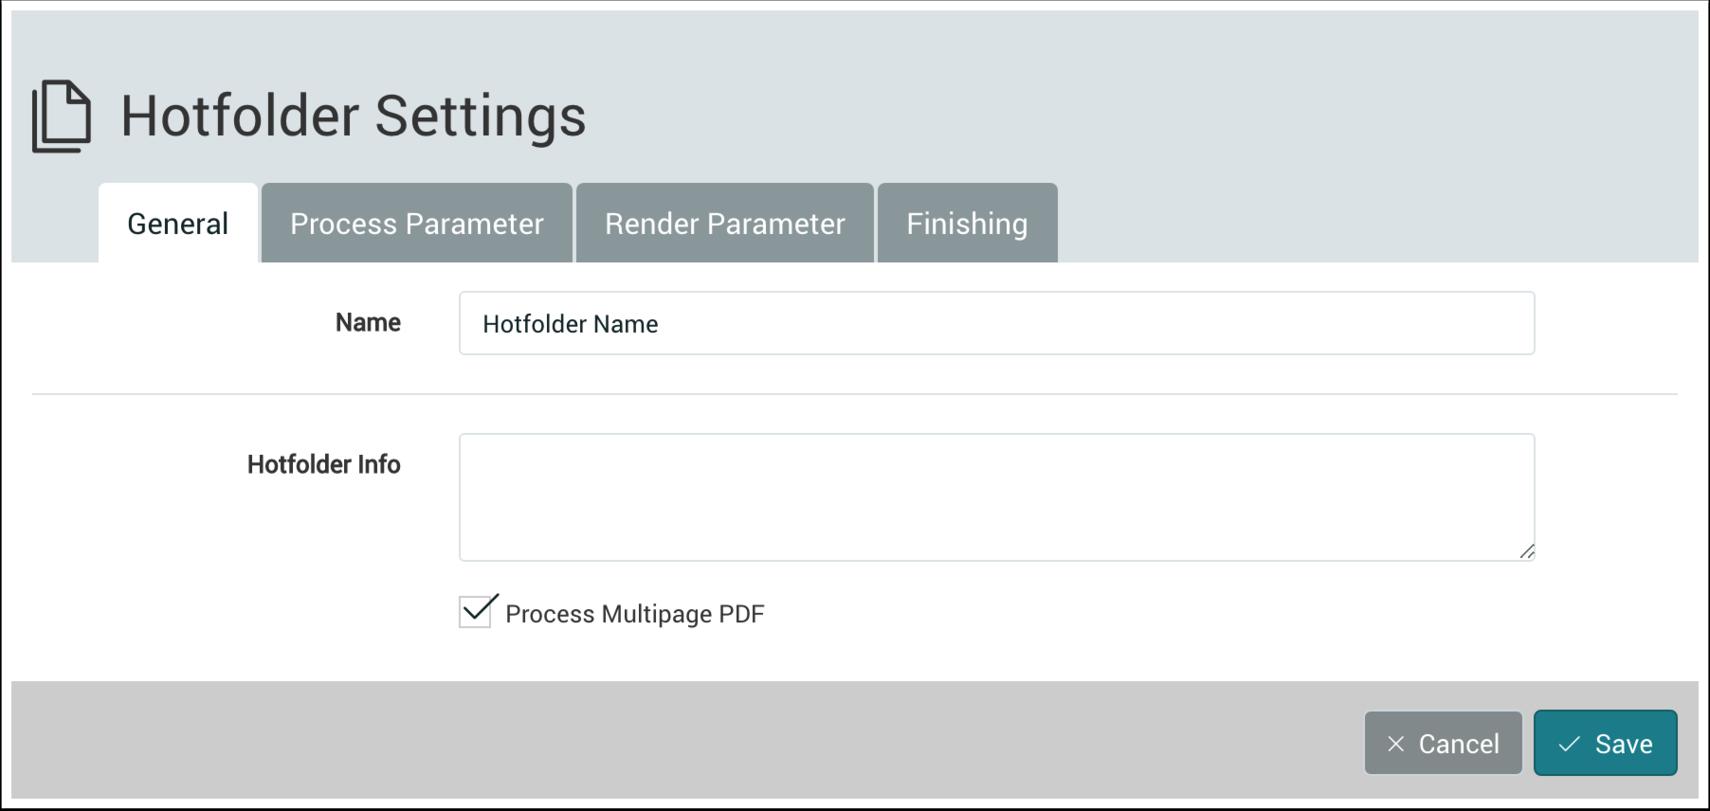 Hotfolder Settings - 1.7.5